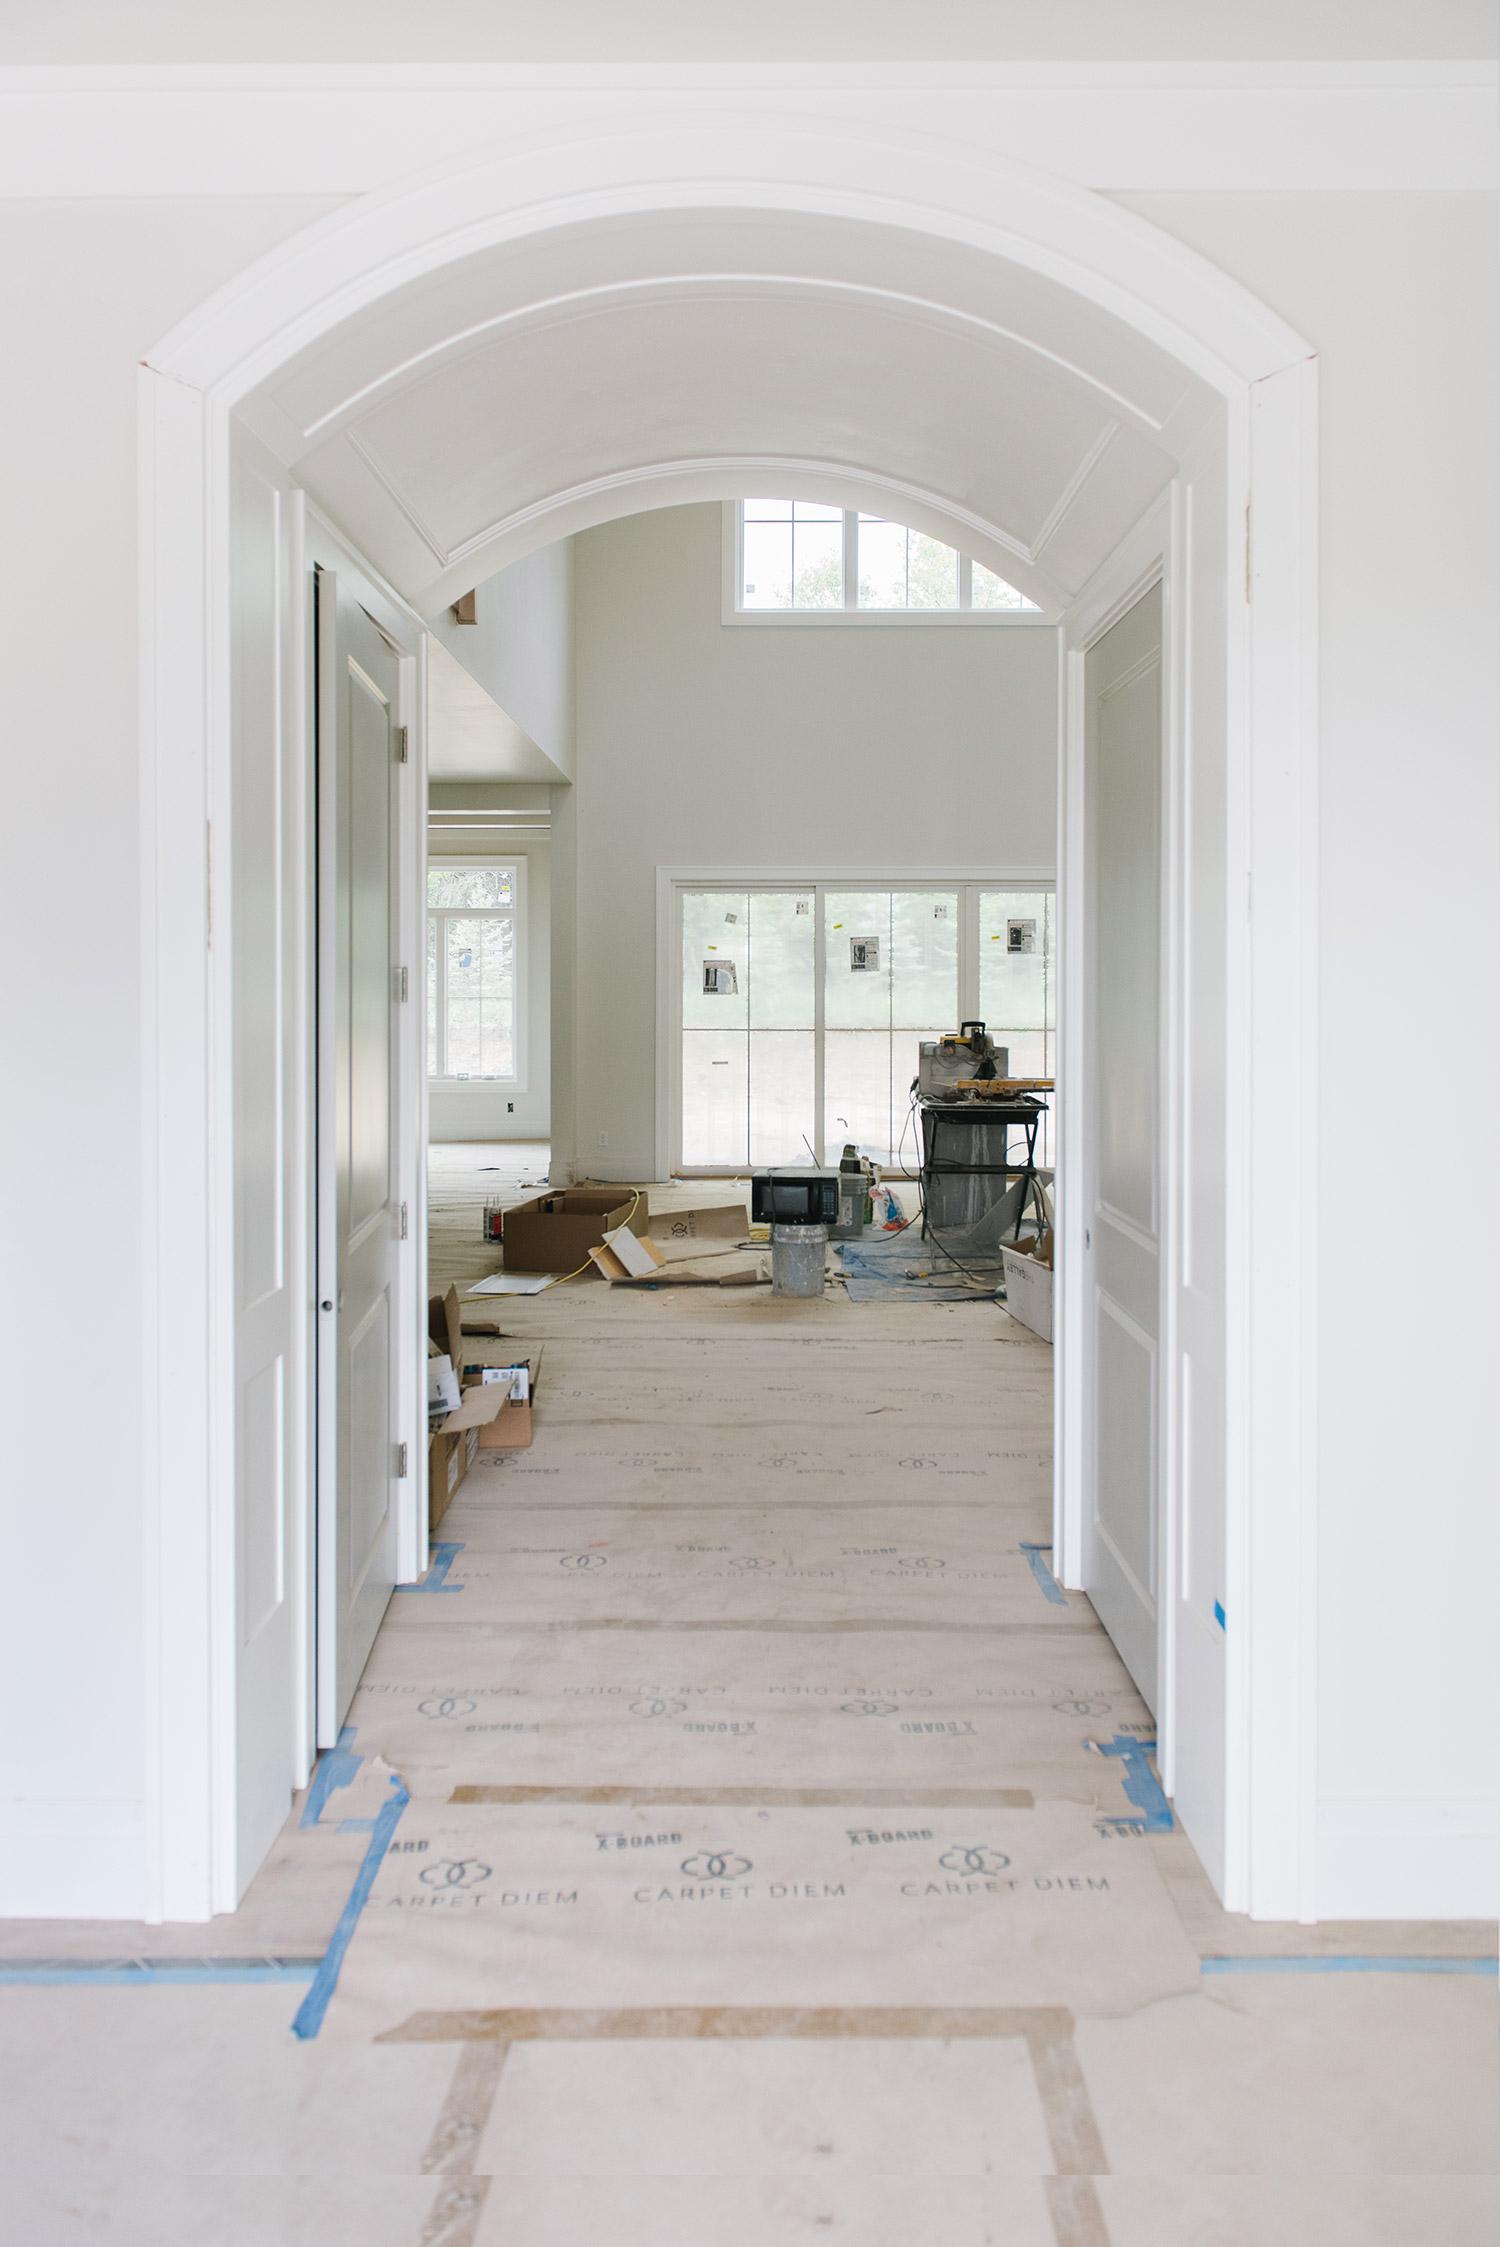 home remodel project by Tami Faulkner - interior spatial designer in Sacramento.jpg